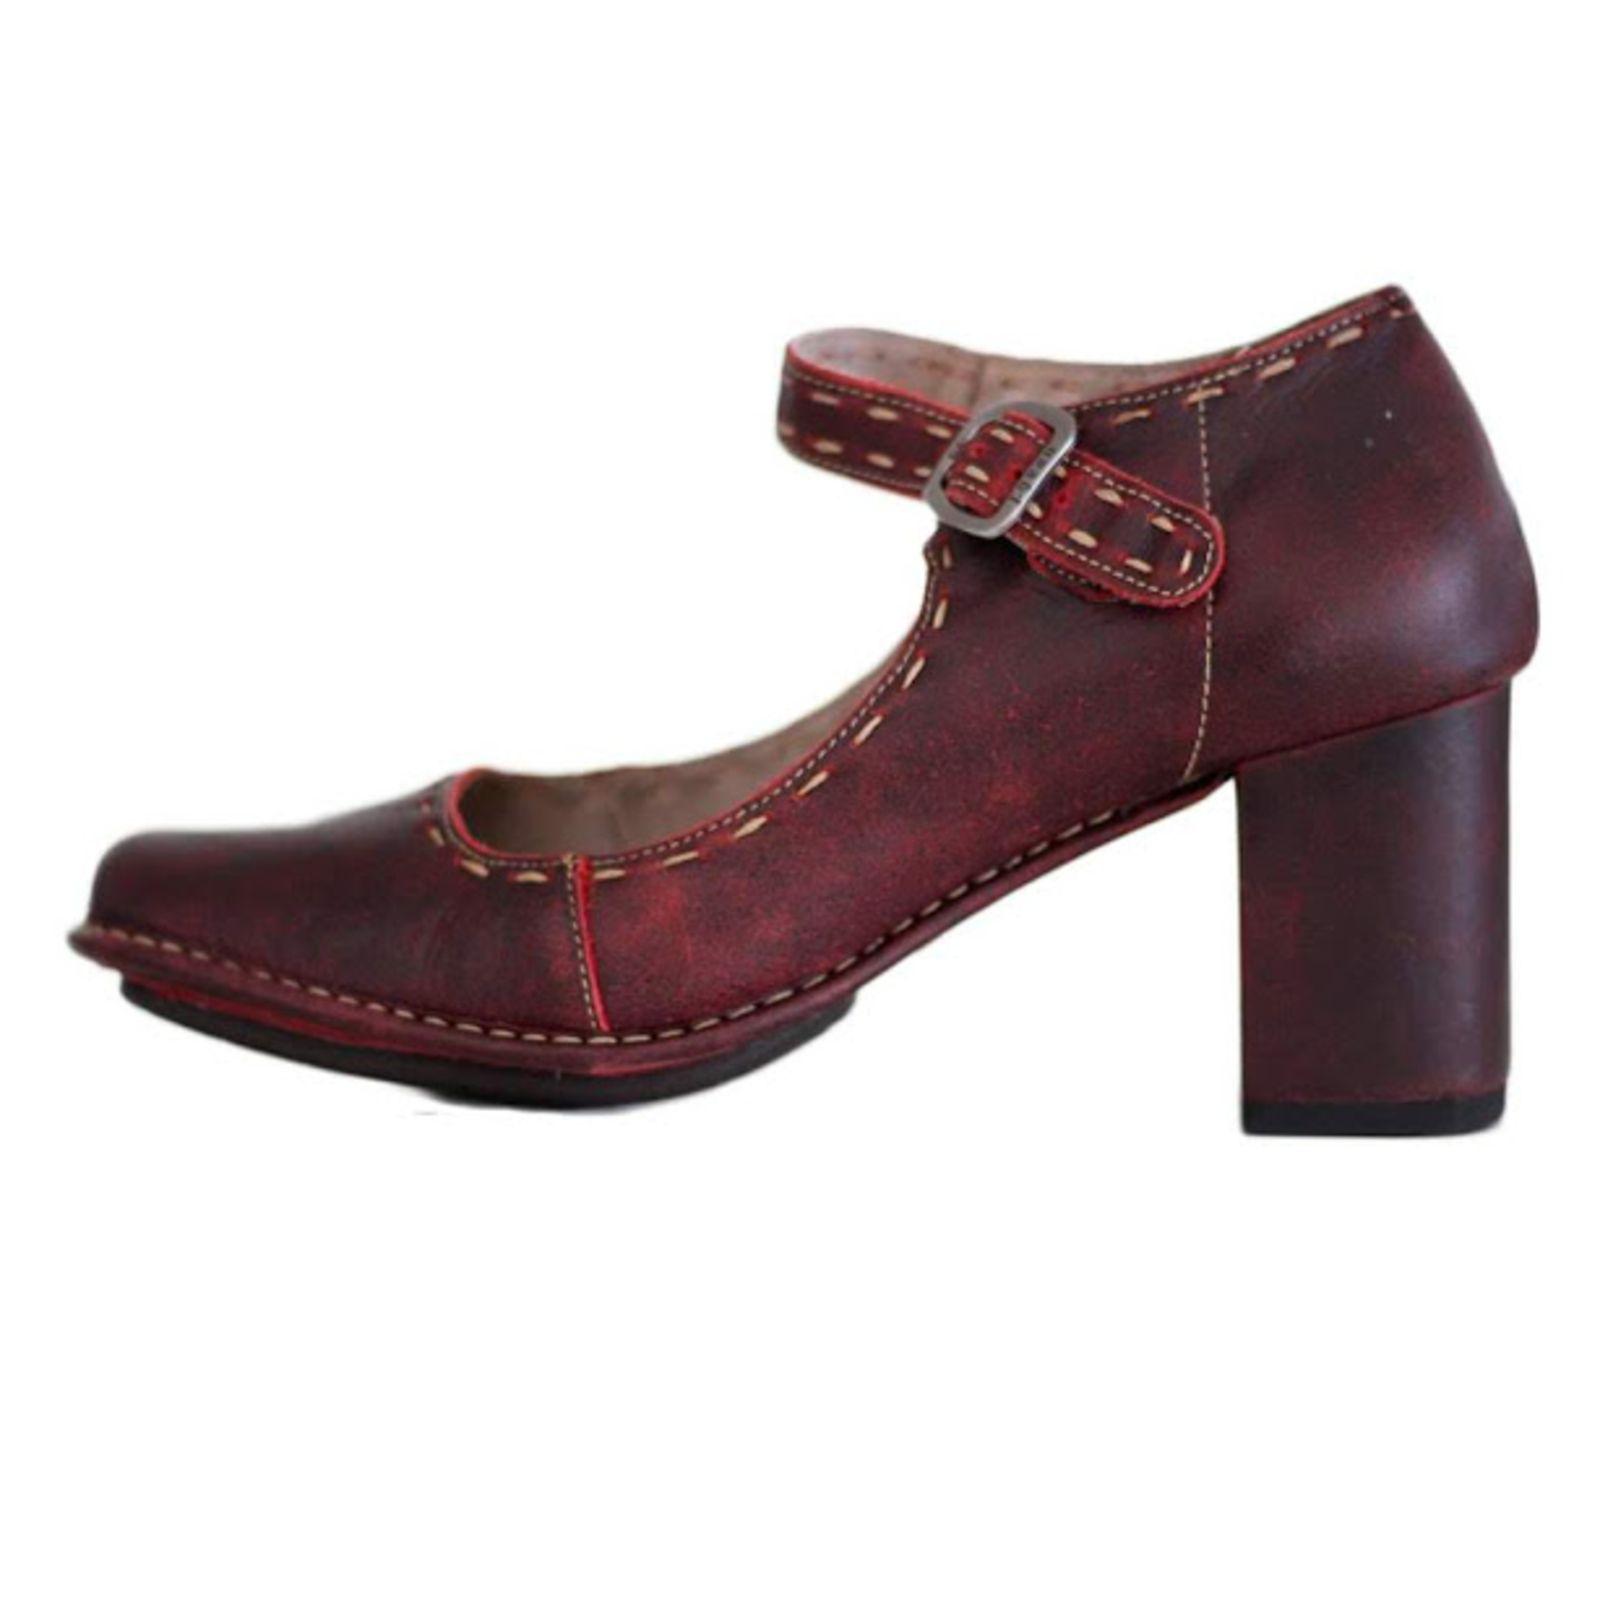 d85814411 Sapato J. Gean Retro Vintage Salto Grosso Couro Vermelho   Products ...